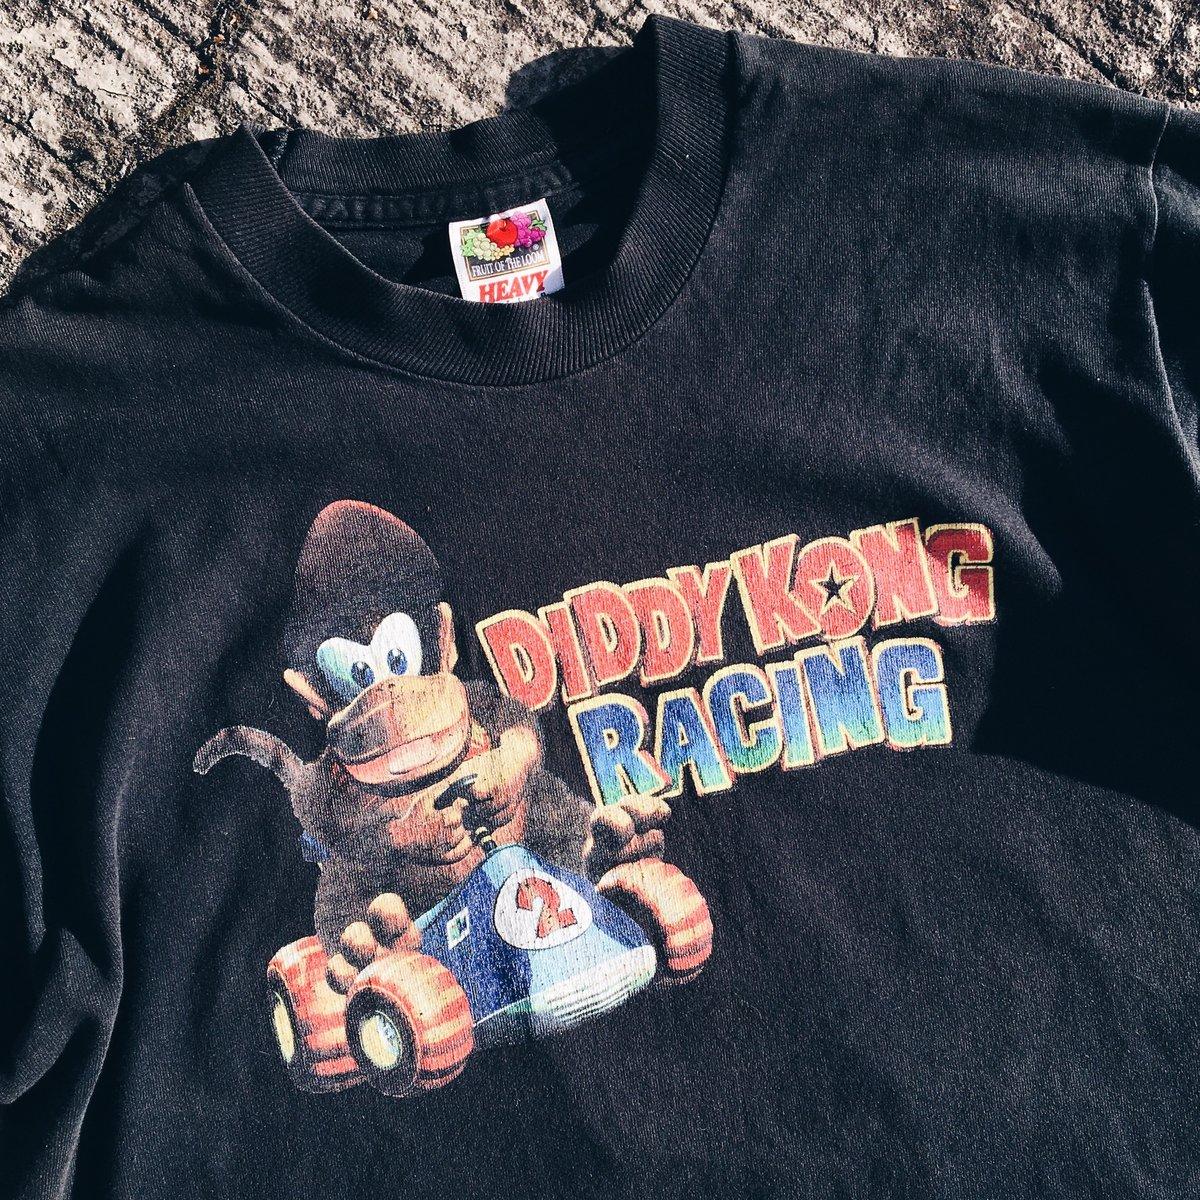 Image of Original 90's Diddy Kong Racing Promo Video Game Tee.